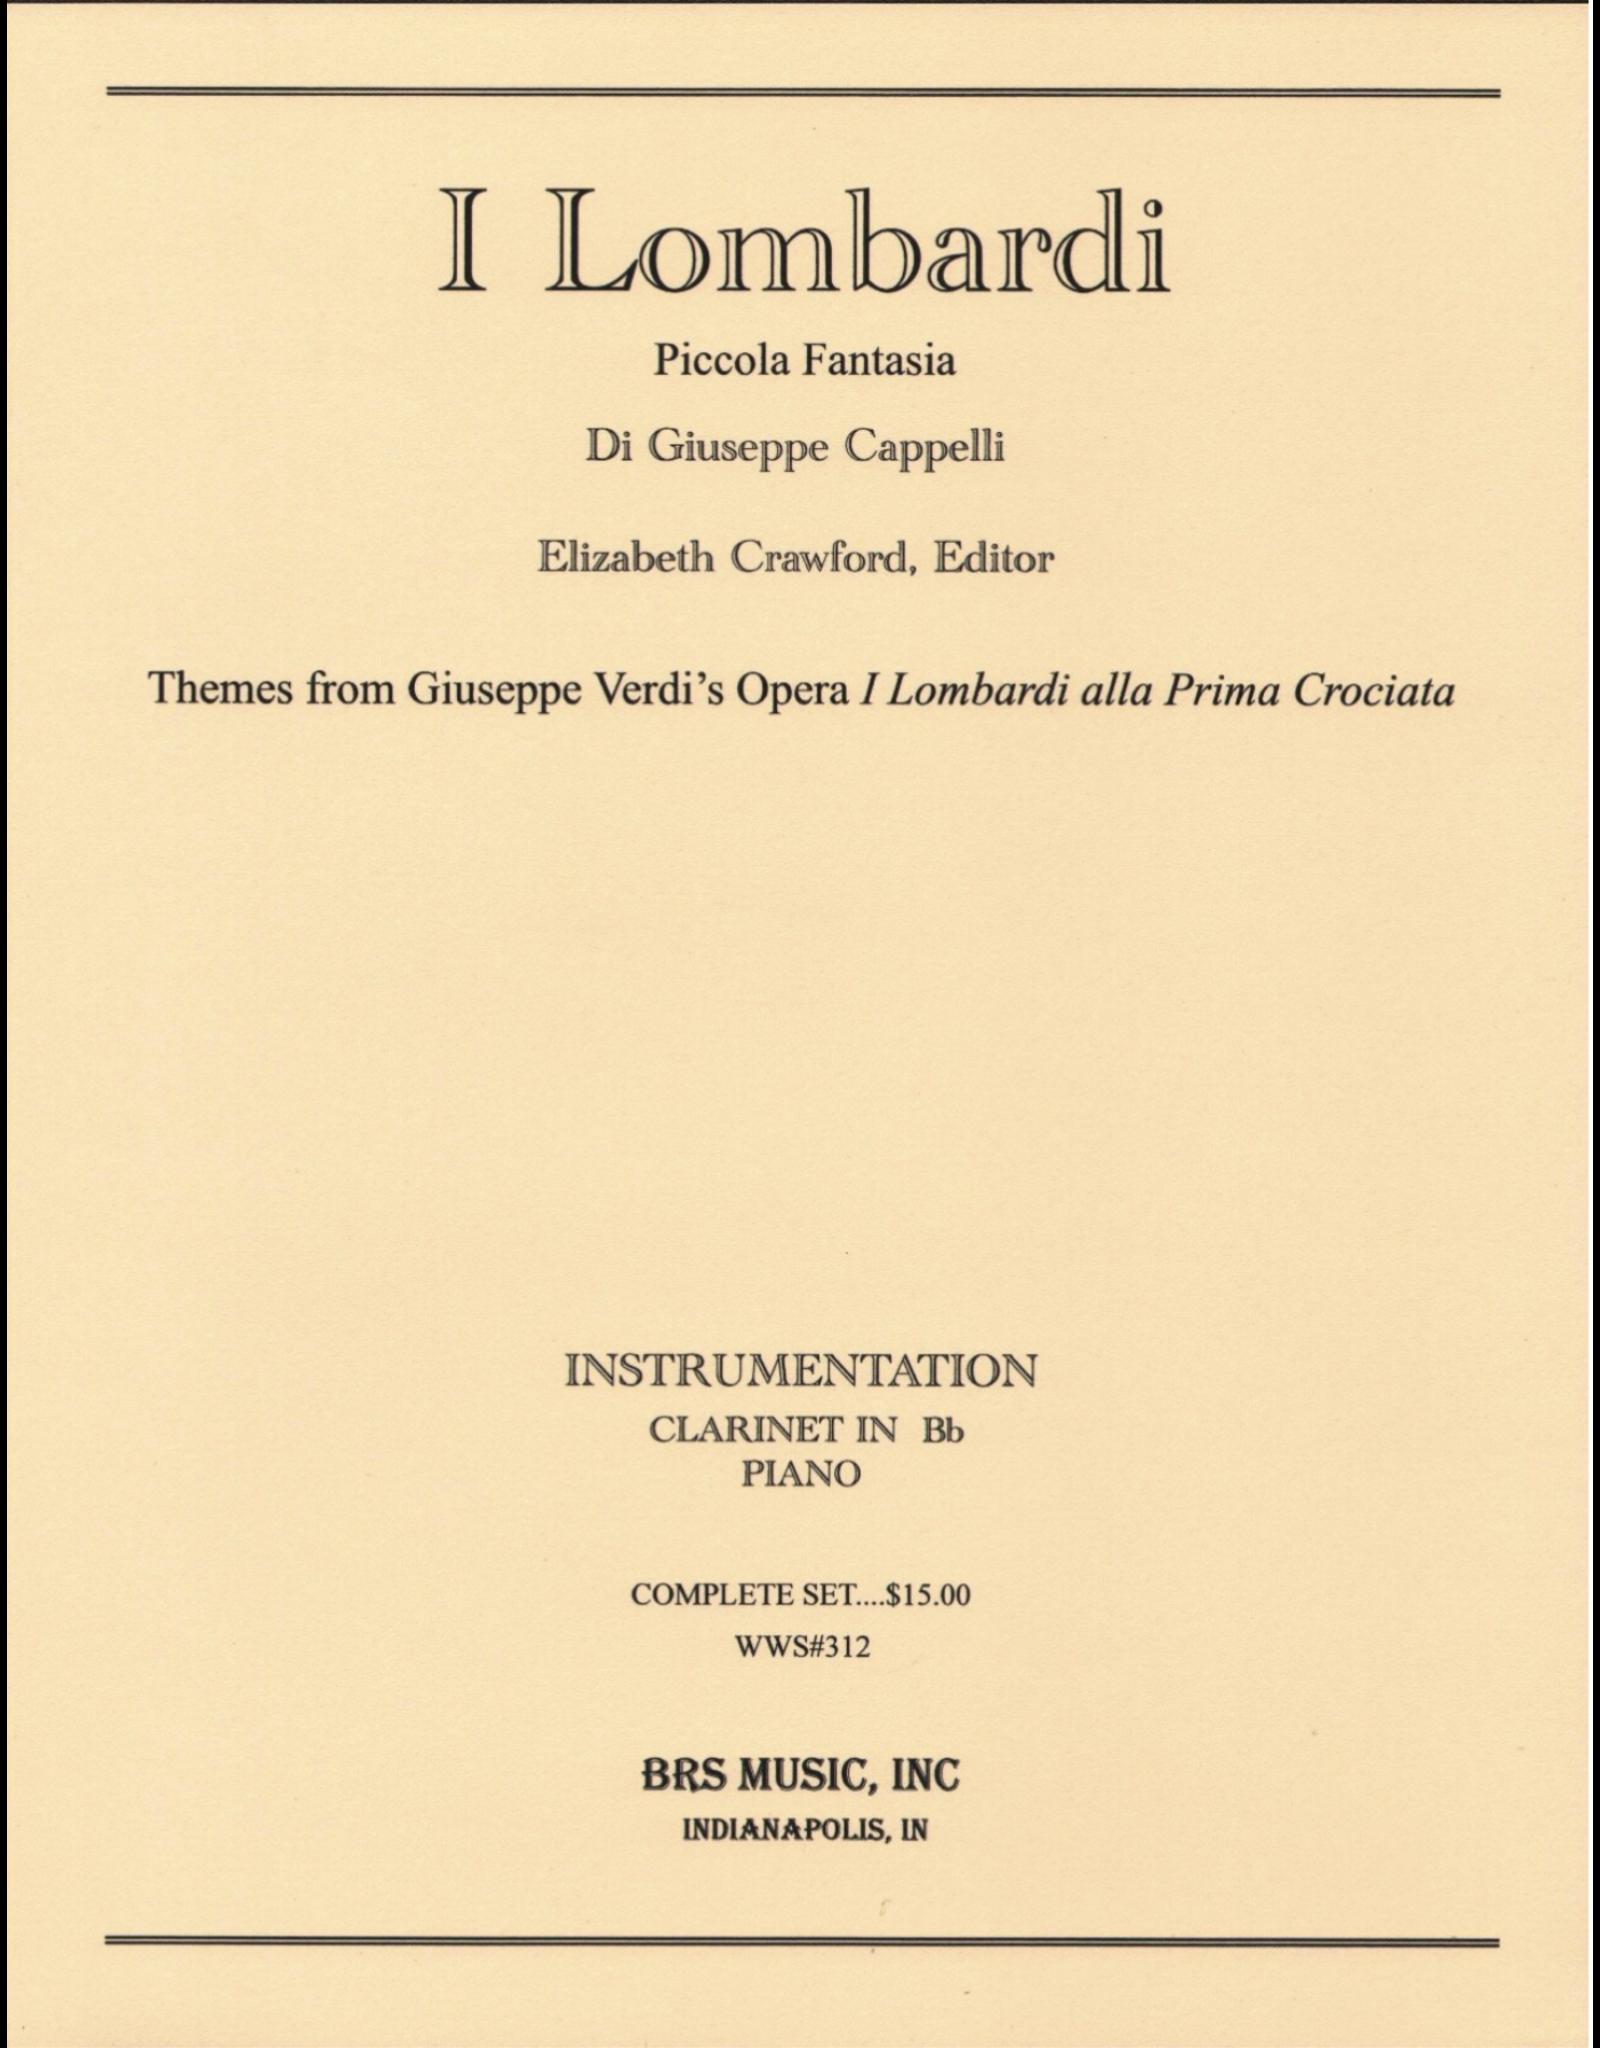 Generic Cappelli - I Lombardi